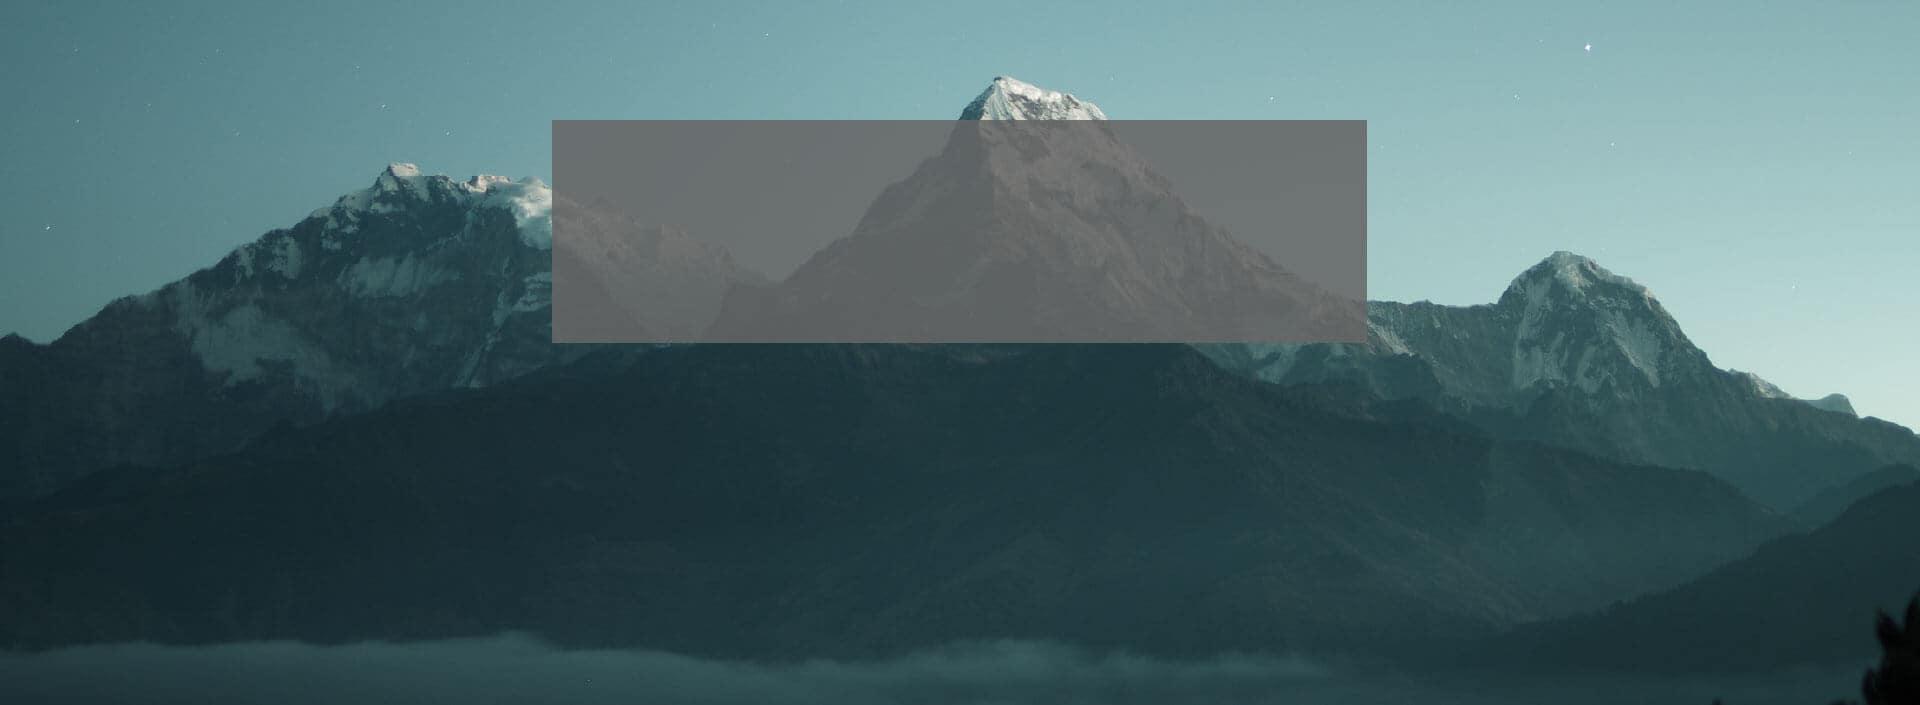 Perkins Background